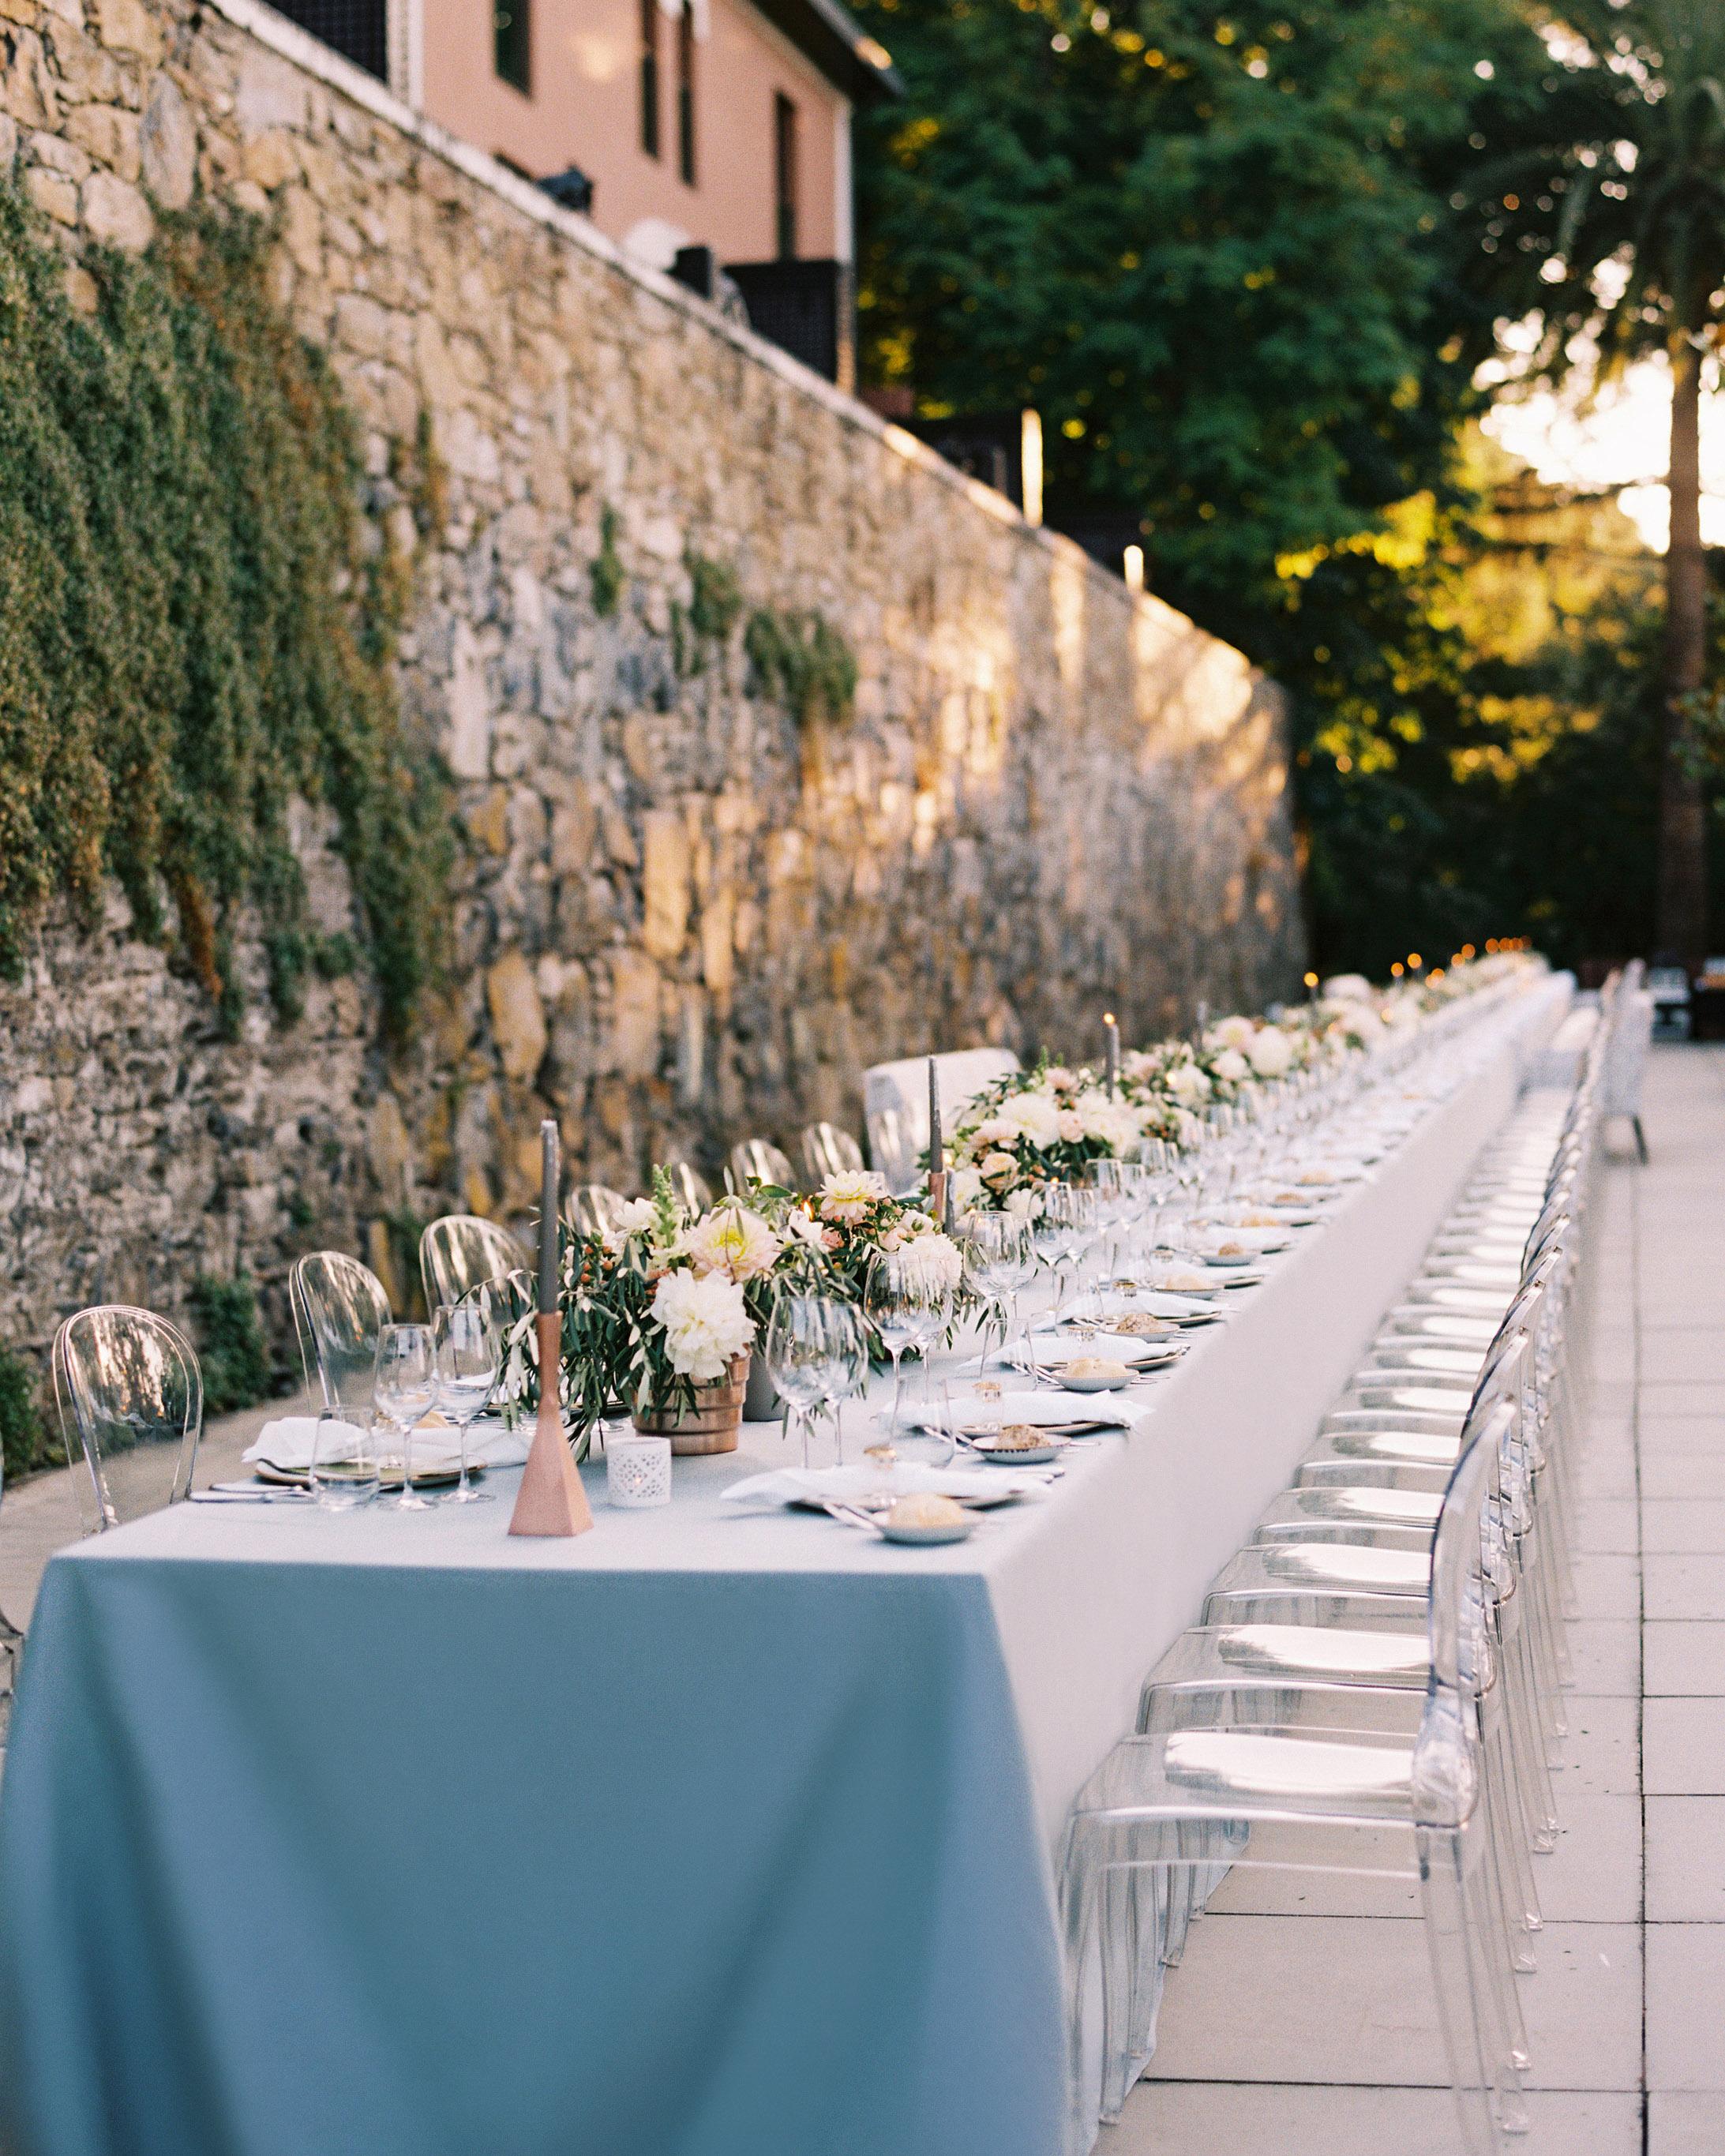 jeannette taylor wedding portugal table